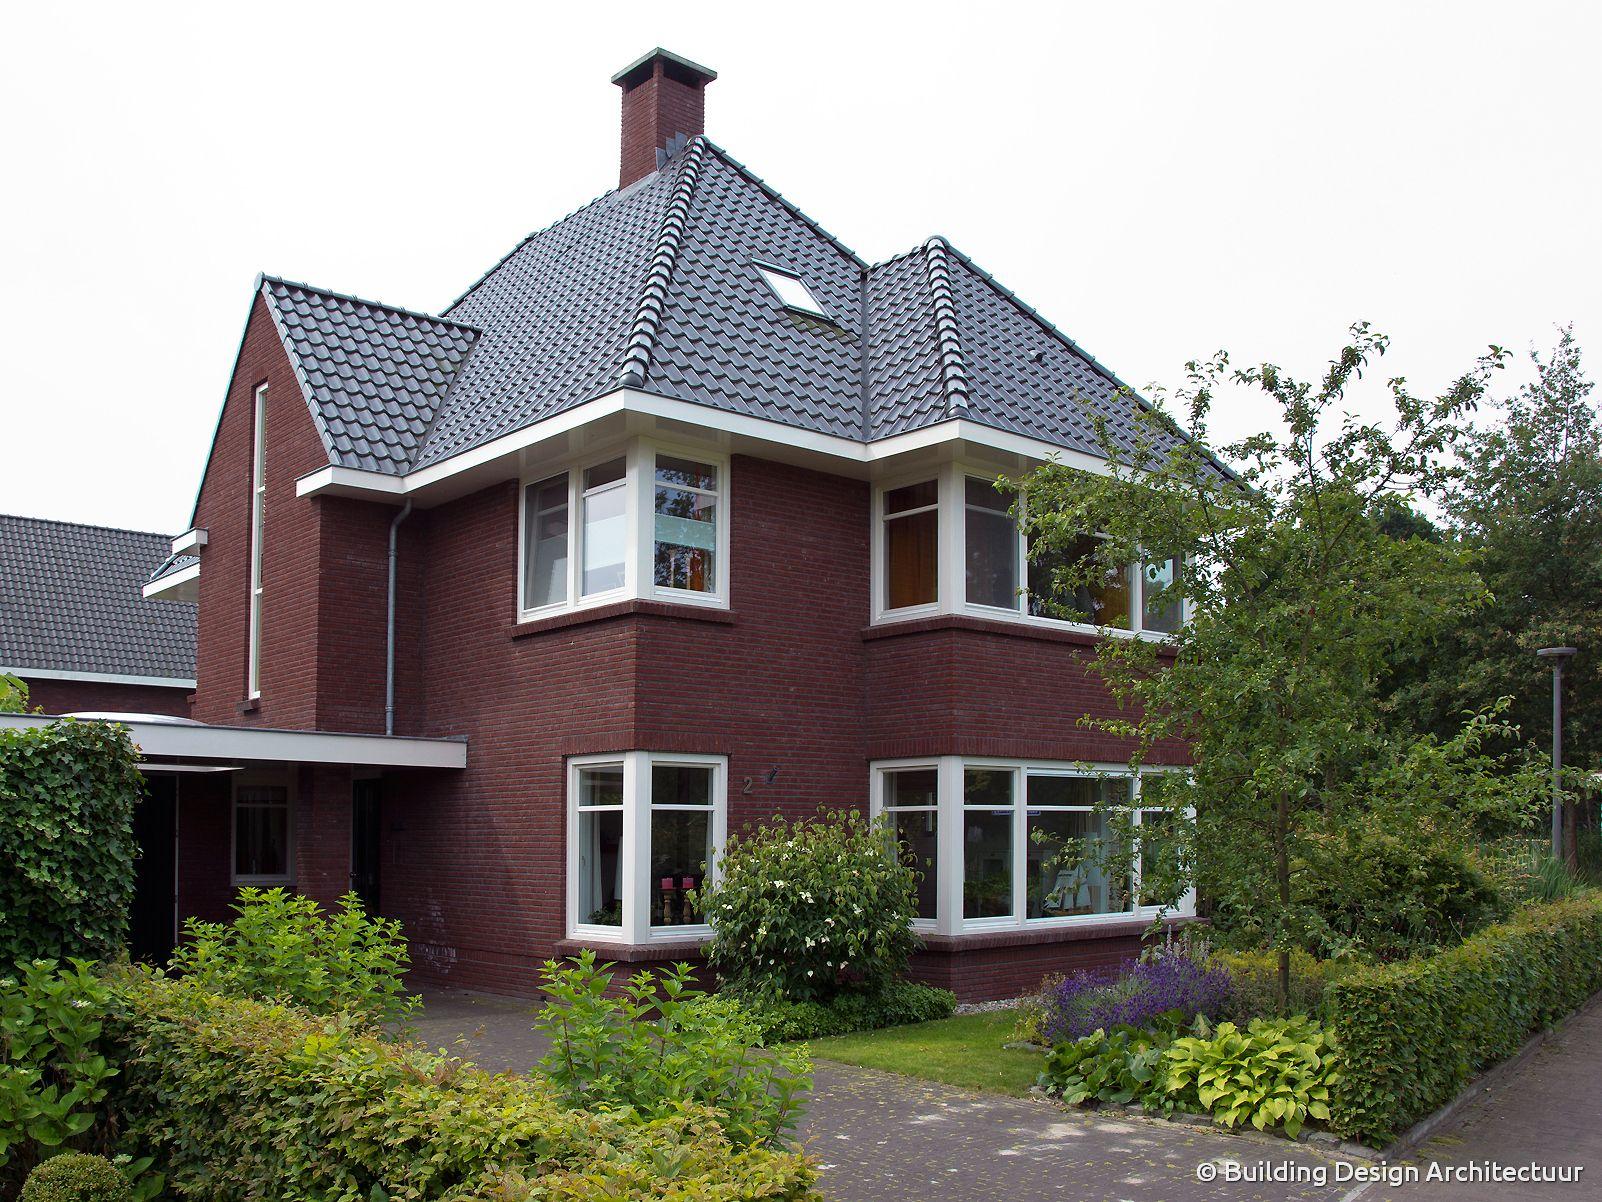 Woning in jaren 30 stijl building design architectuur for Huizen jaren 30 stijl